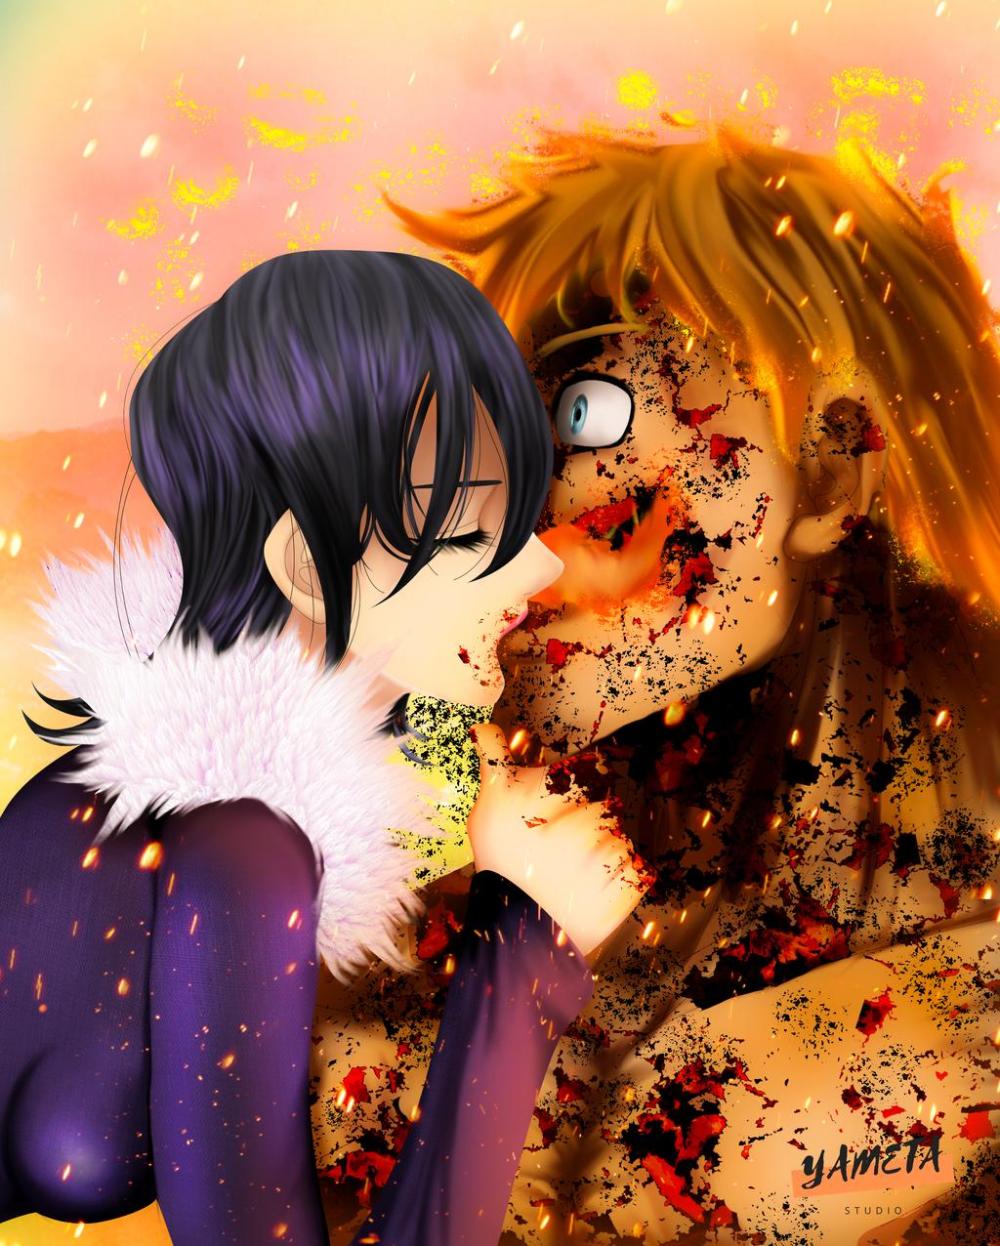 Nanatsu no Taizai 333: The First and the Last Kiss by YametaStudio on DeviantArt